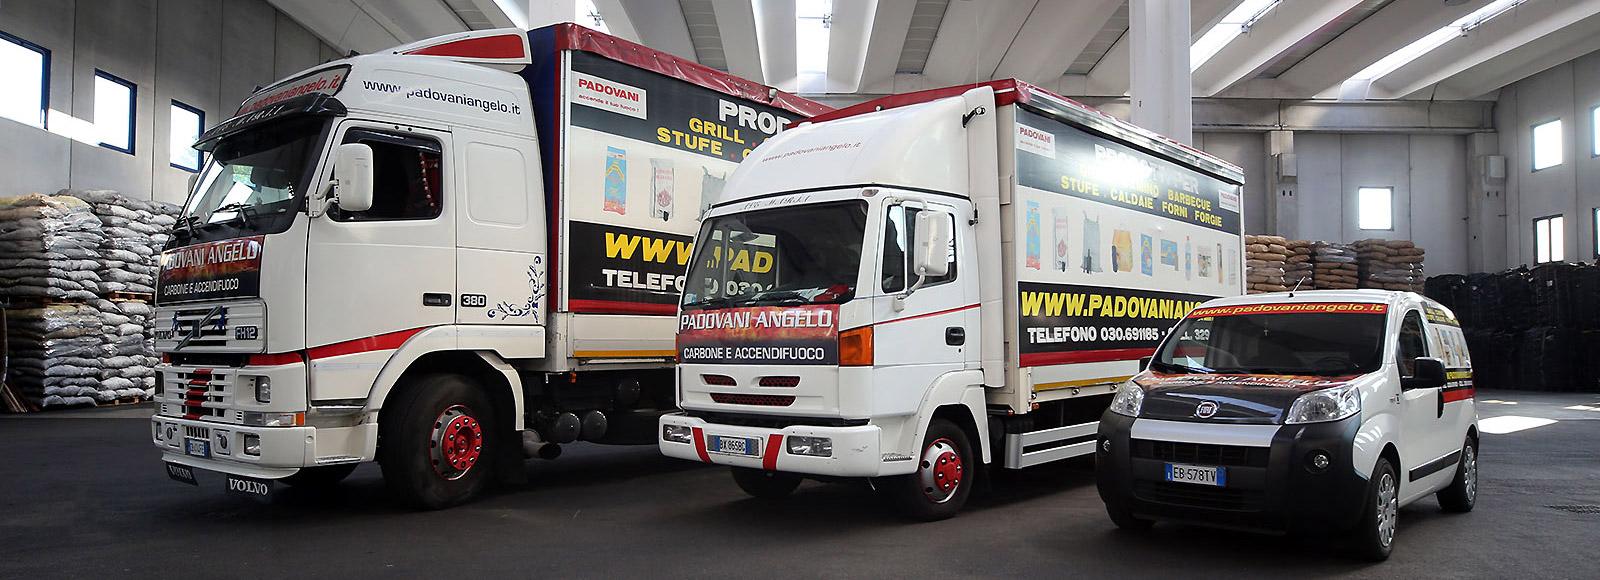 padovani-camion-furgone-furgoncino-panorama